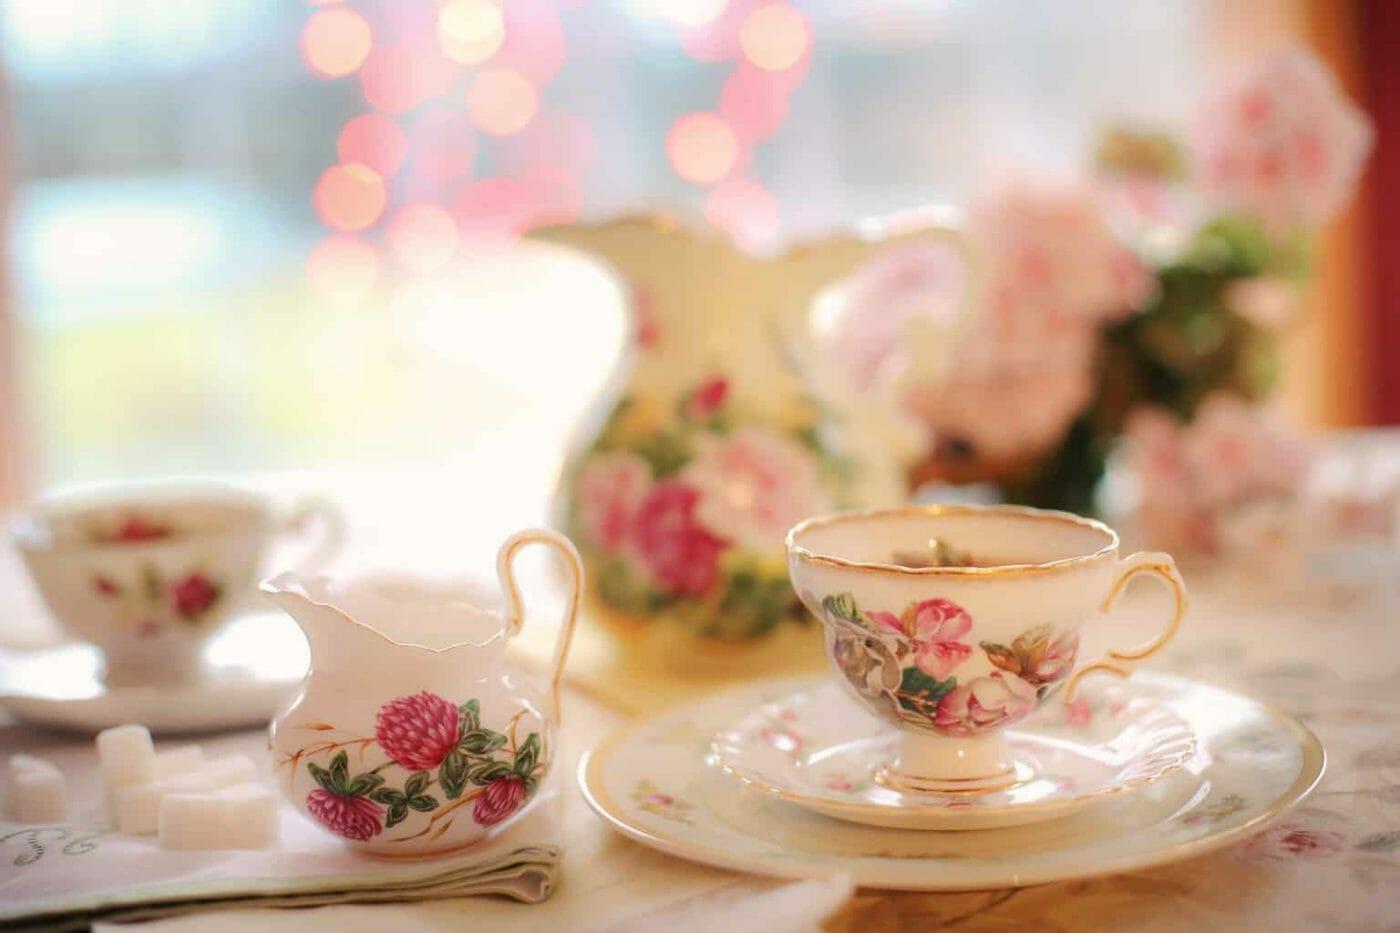 Flowery tea pot and tea cups